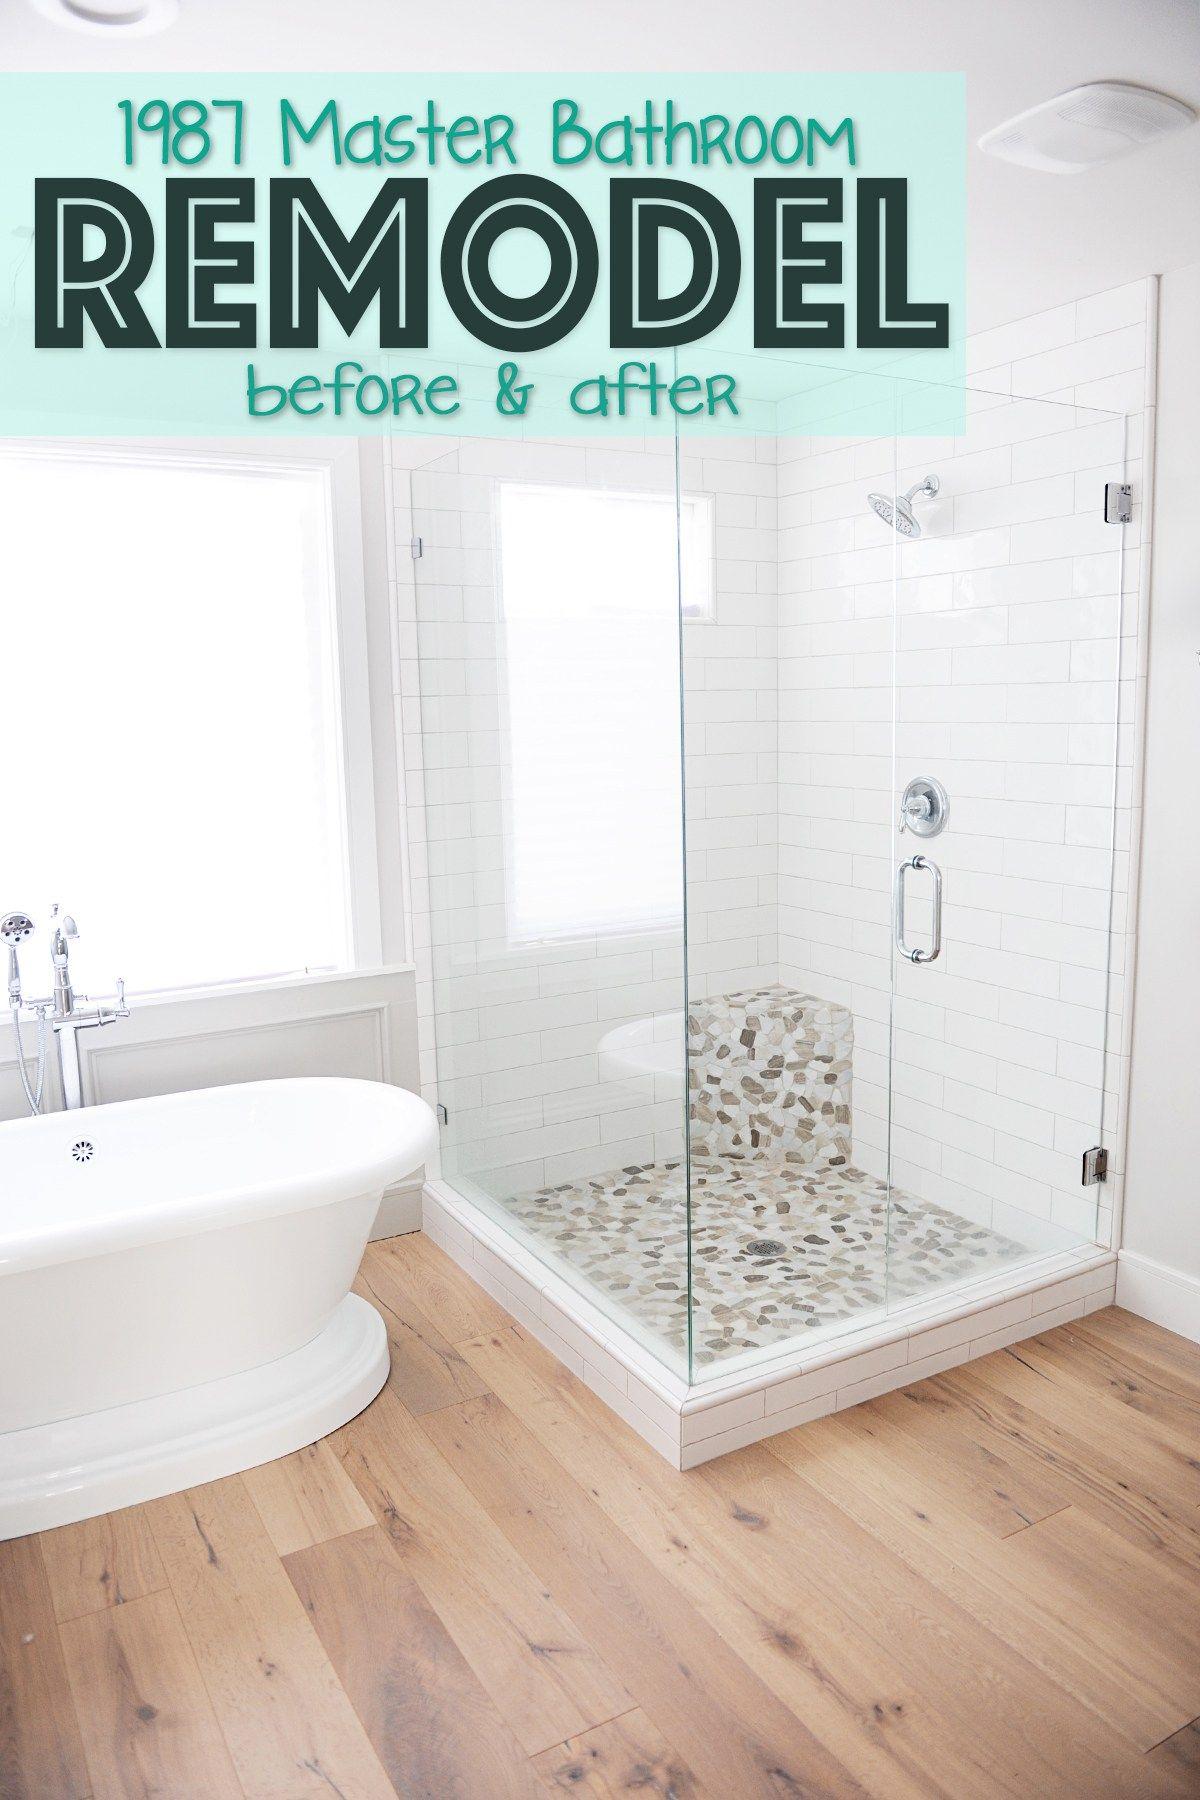 Master Bathroom Remodel Renovation Idea Before And After In 2020 Bathrooms Remodel Bathroom Remodel Master Bathroom Renovations